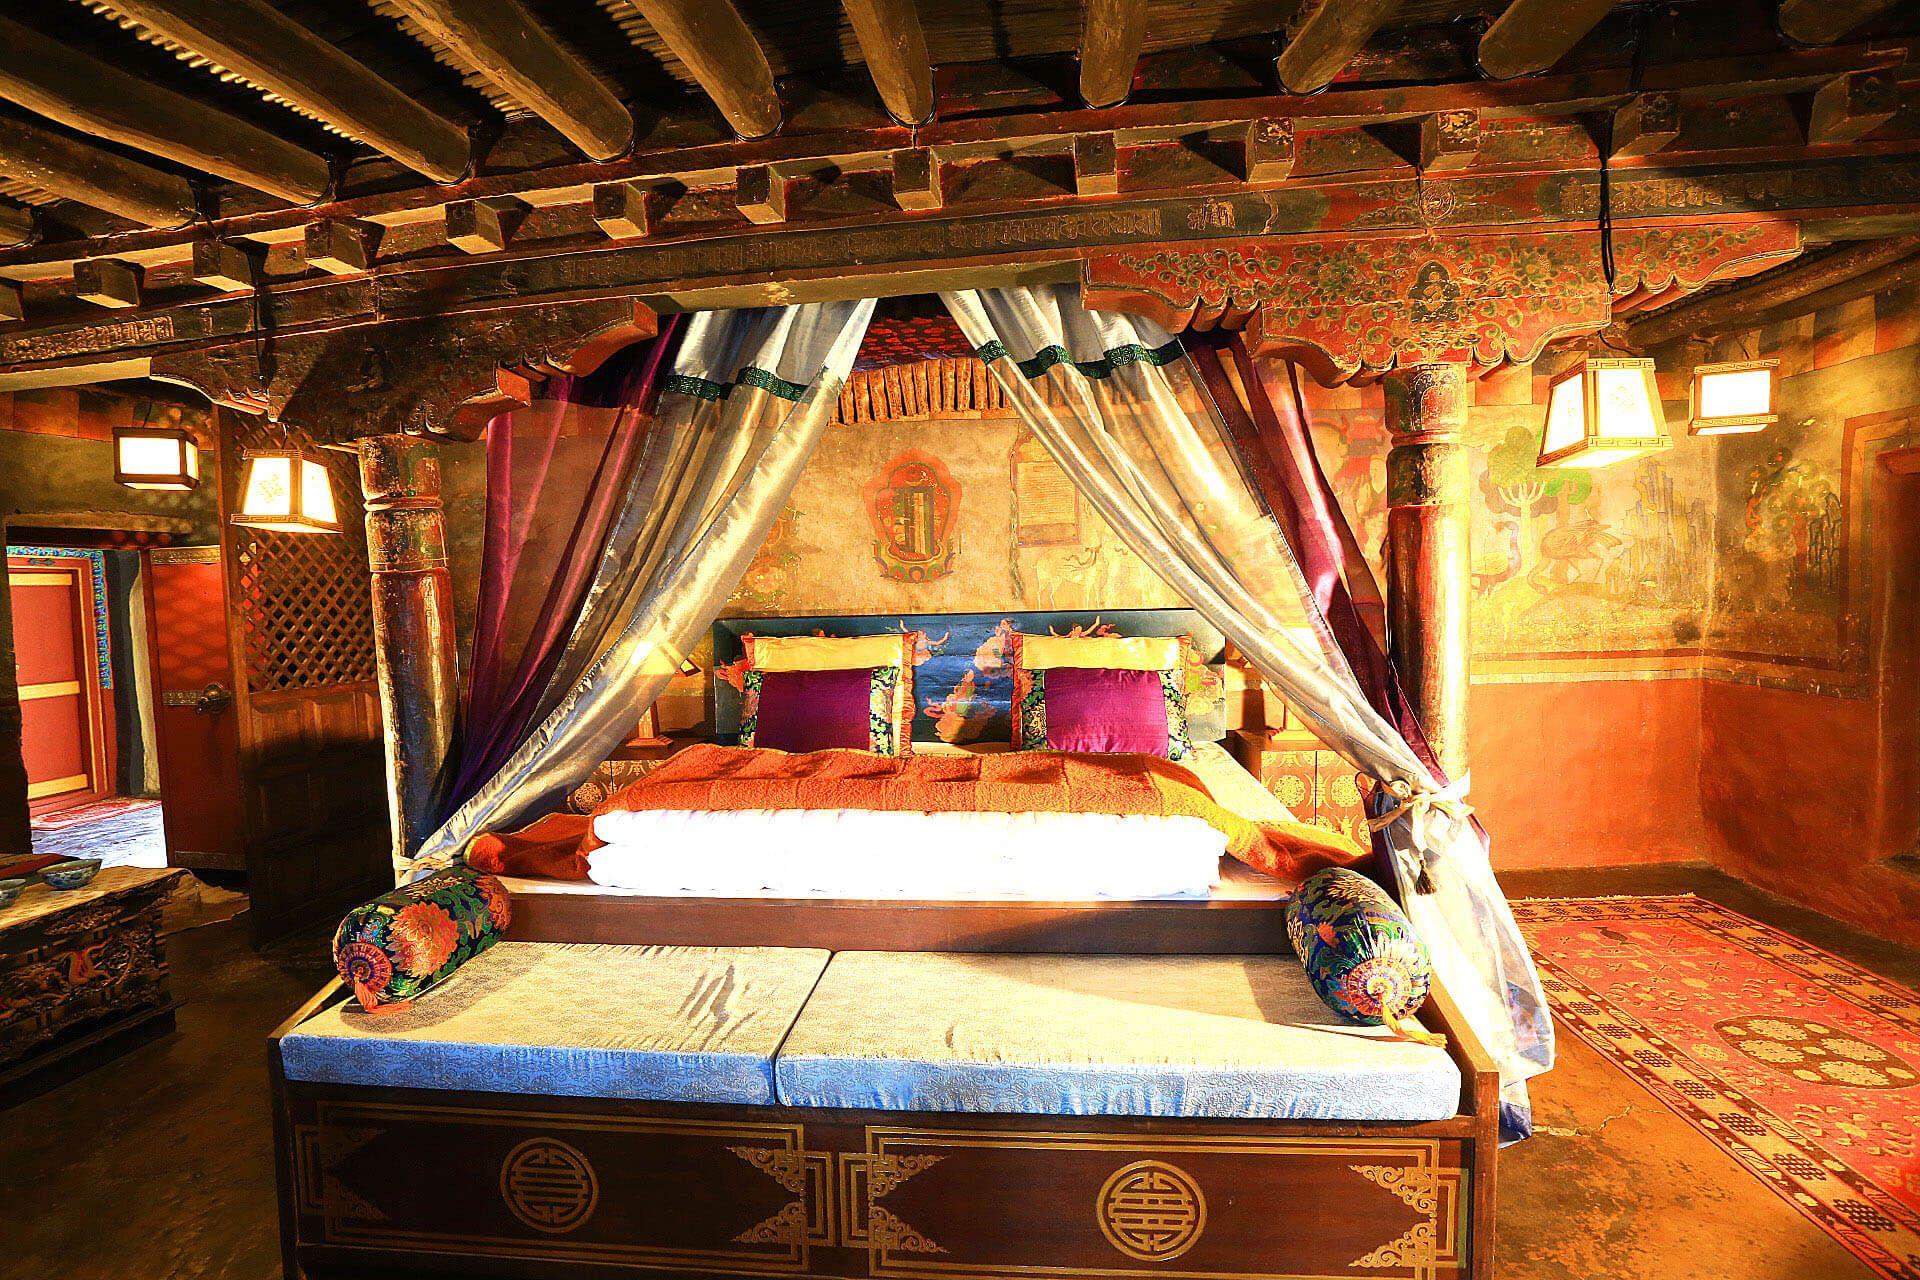 Stok Palace Heritage Hotel / Stok, Ladakh, Jammu And